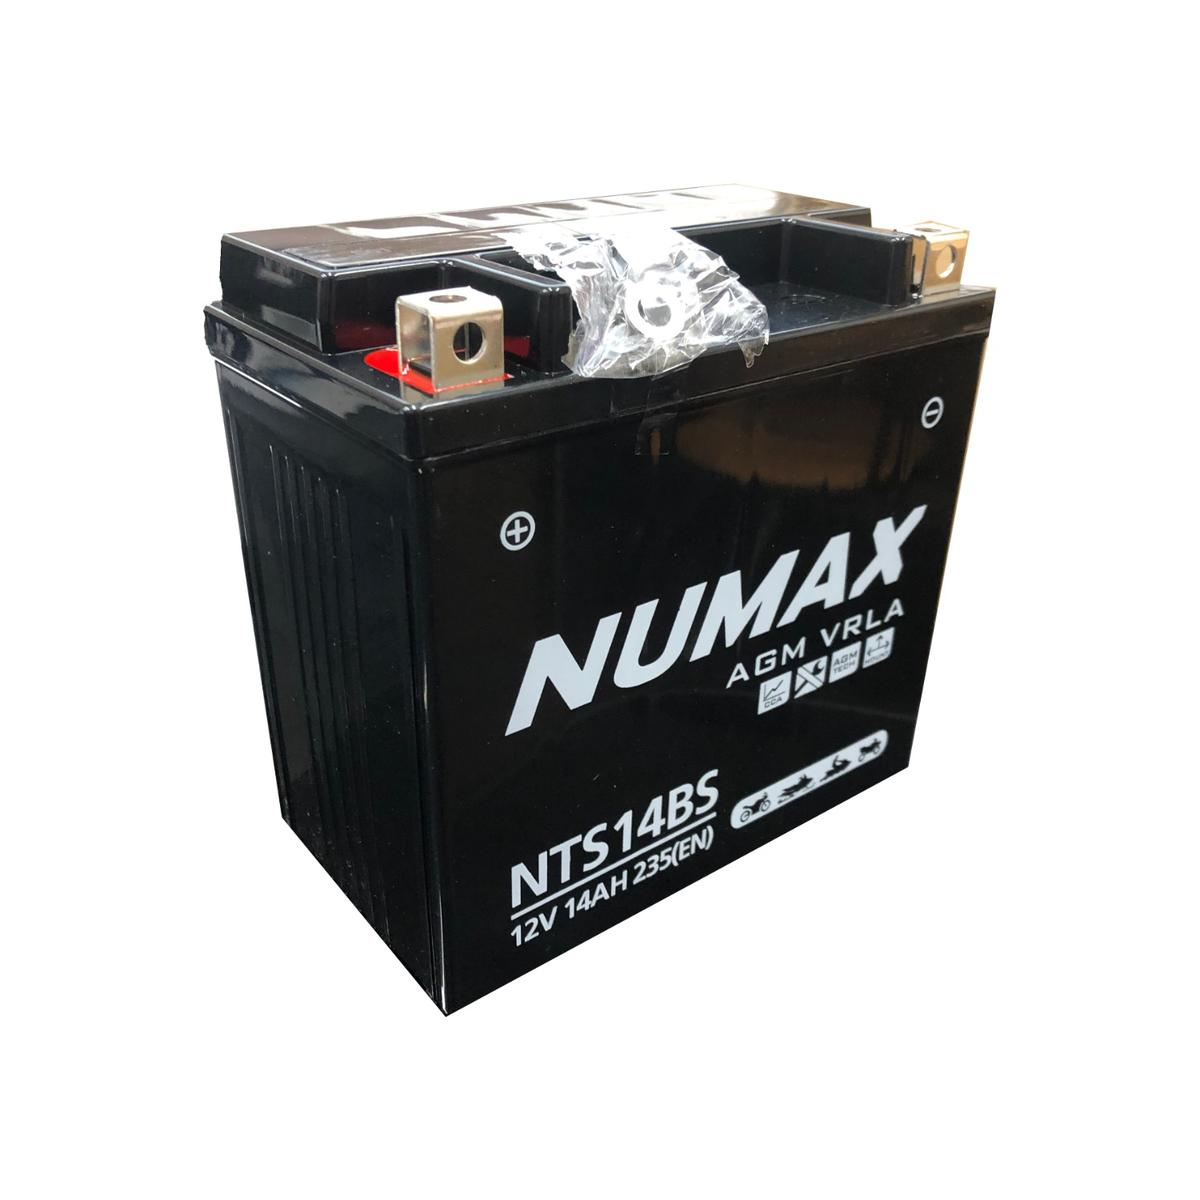 Numax NTS14BS 12v Motorbike Bike Battery KAWASAKI 1100cc ZX1100E YTX14-4